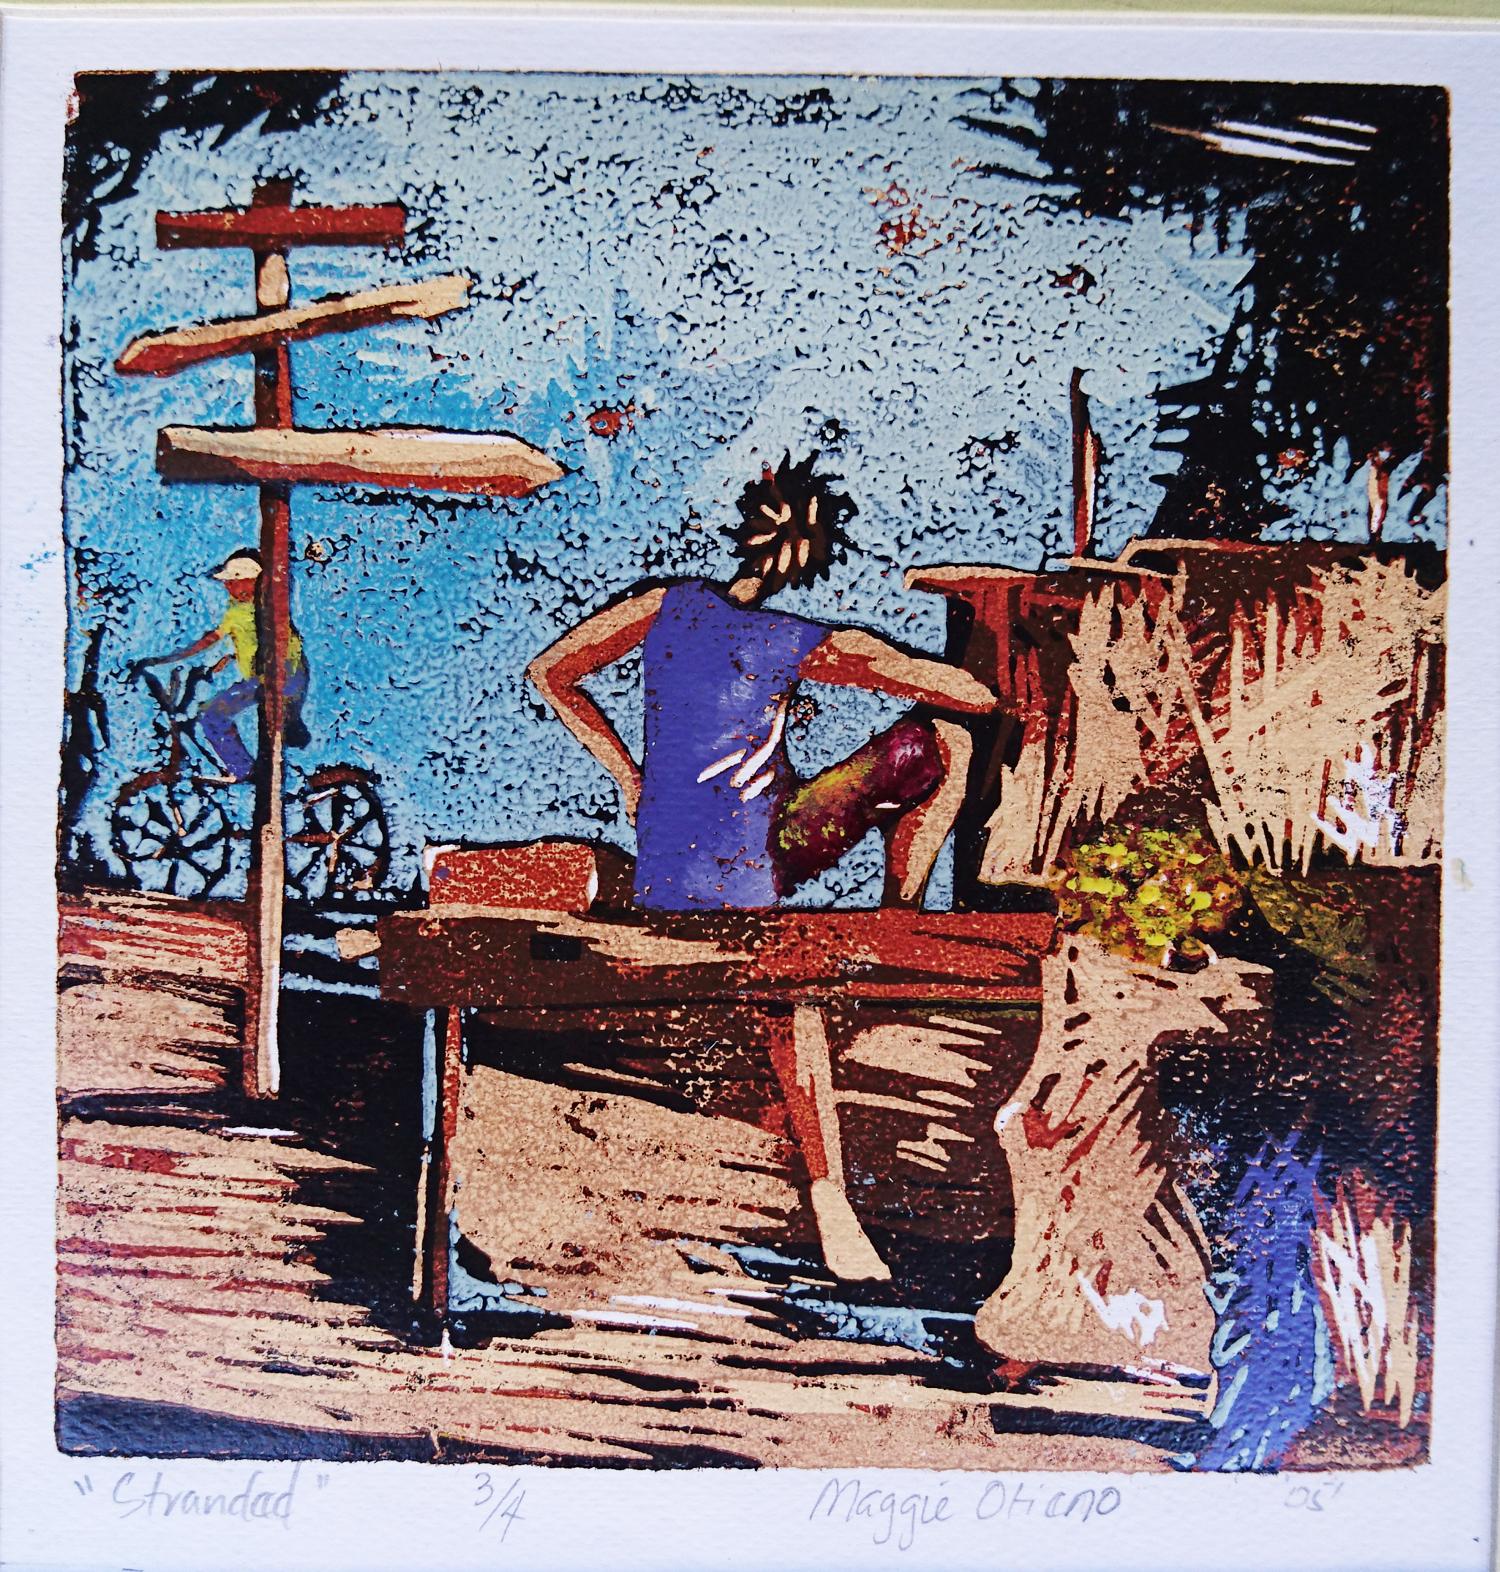 Stranded - Colour Print